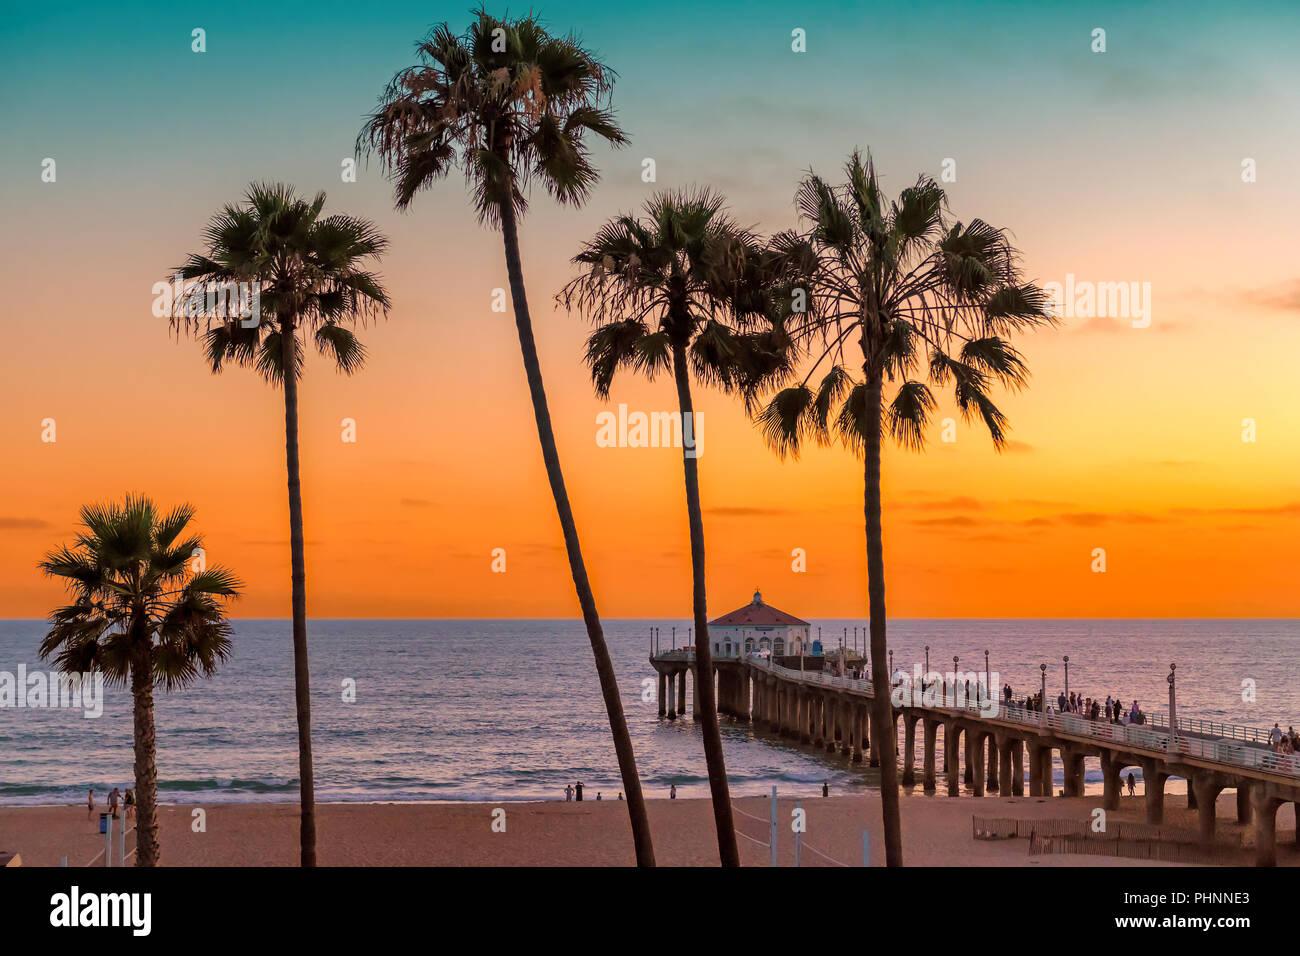 California beach at sunset - Stock Image